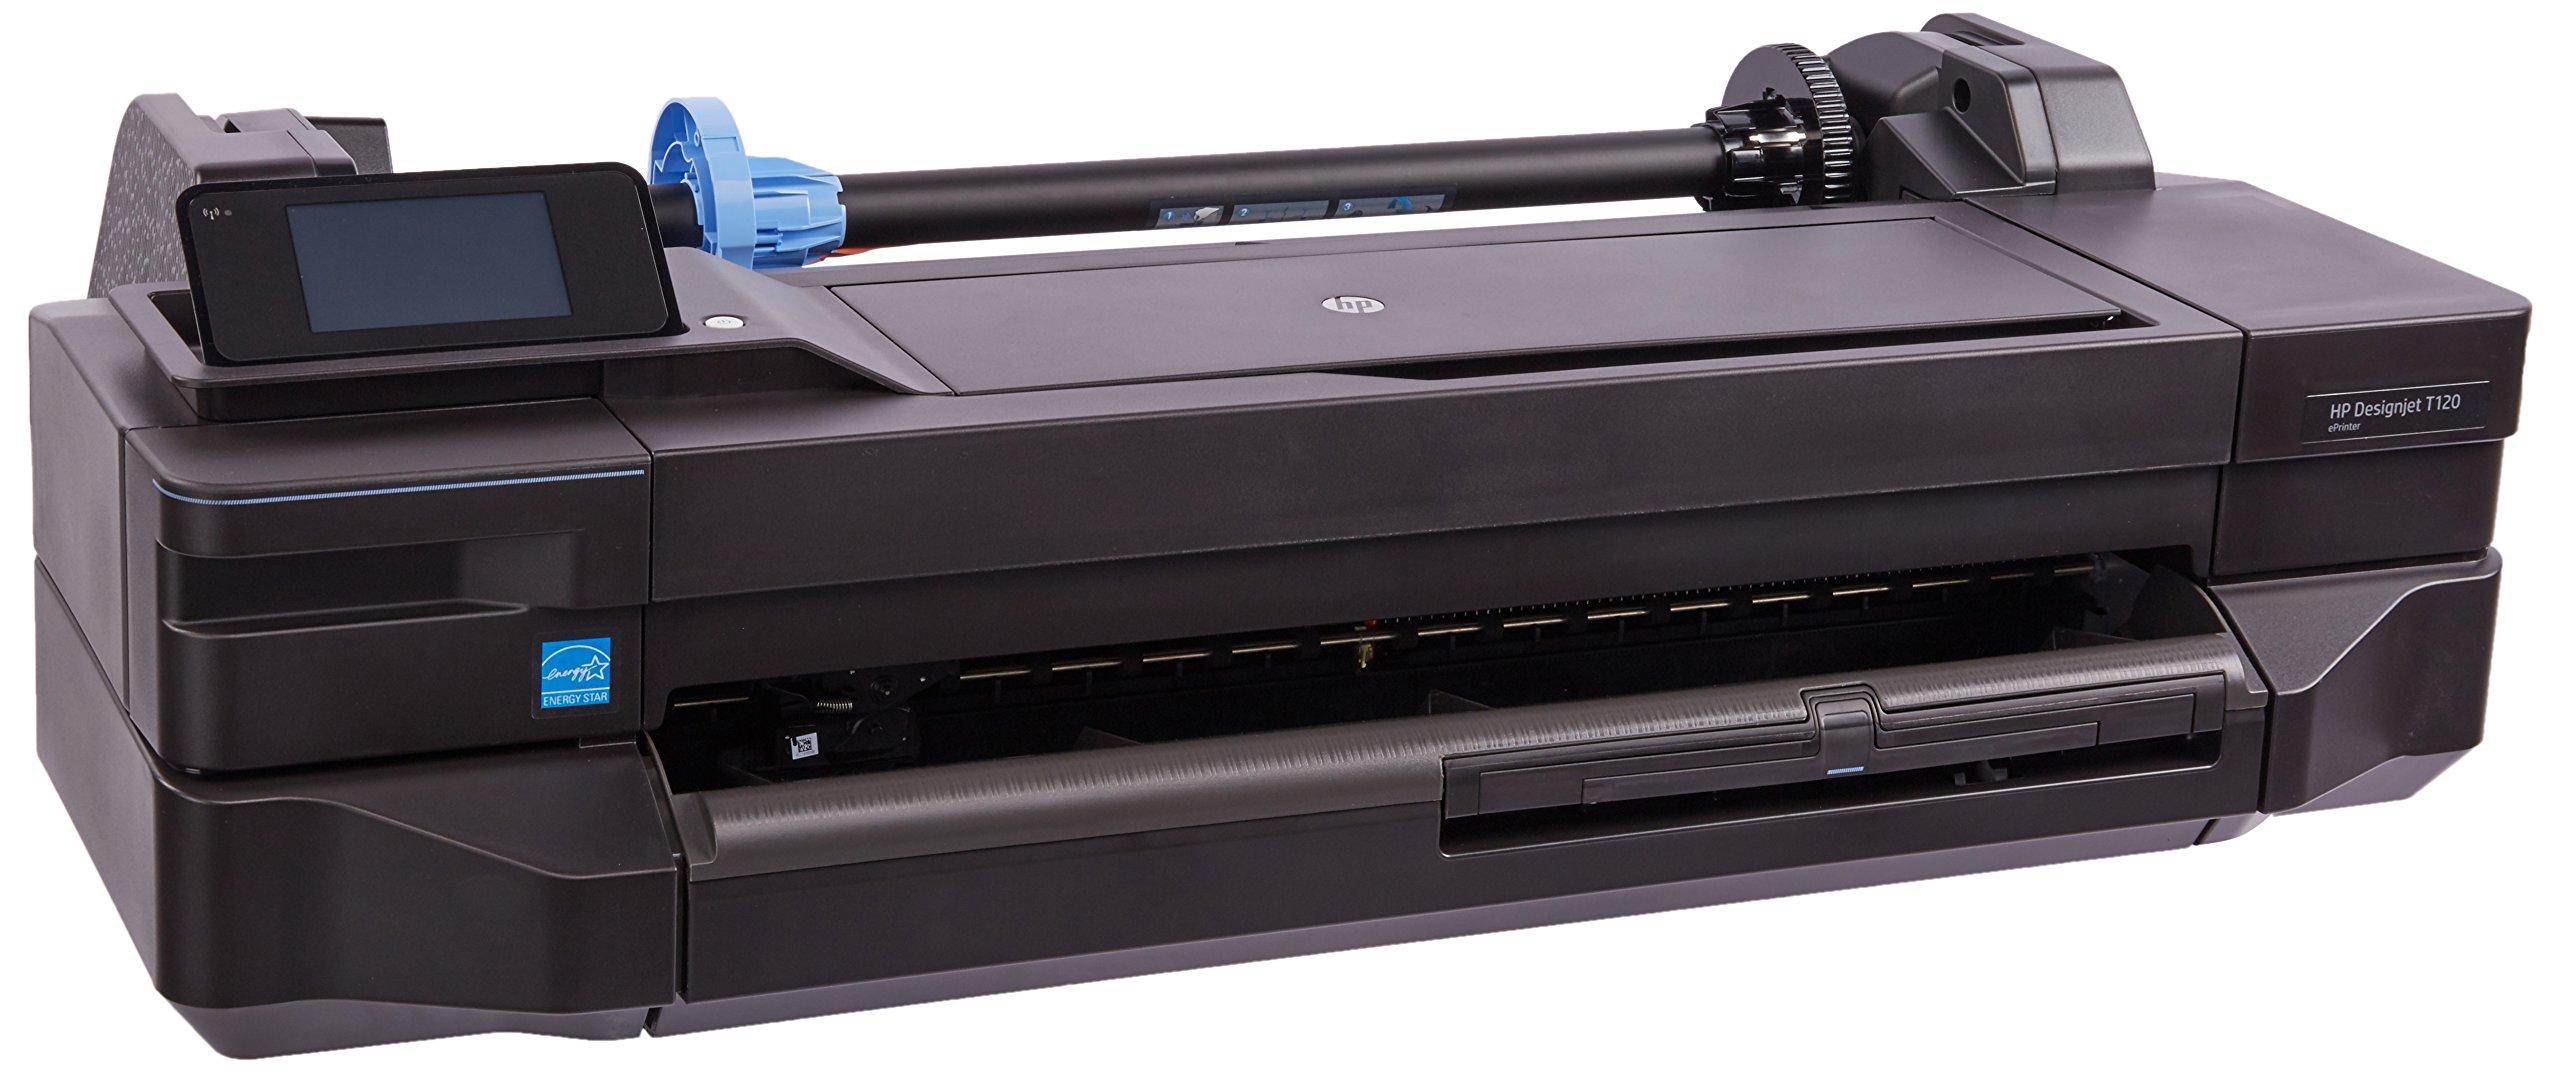 2PX9507 - HP Designjet T120 Inkjet Large Format Printer - 24quot; - Color by HP